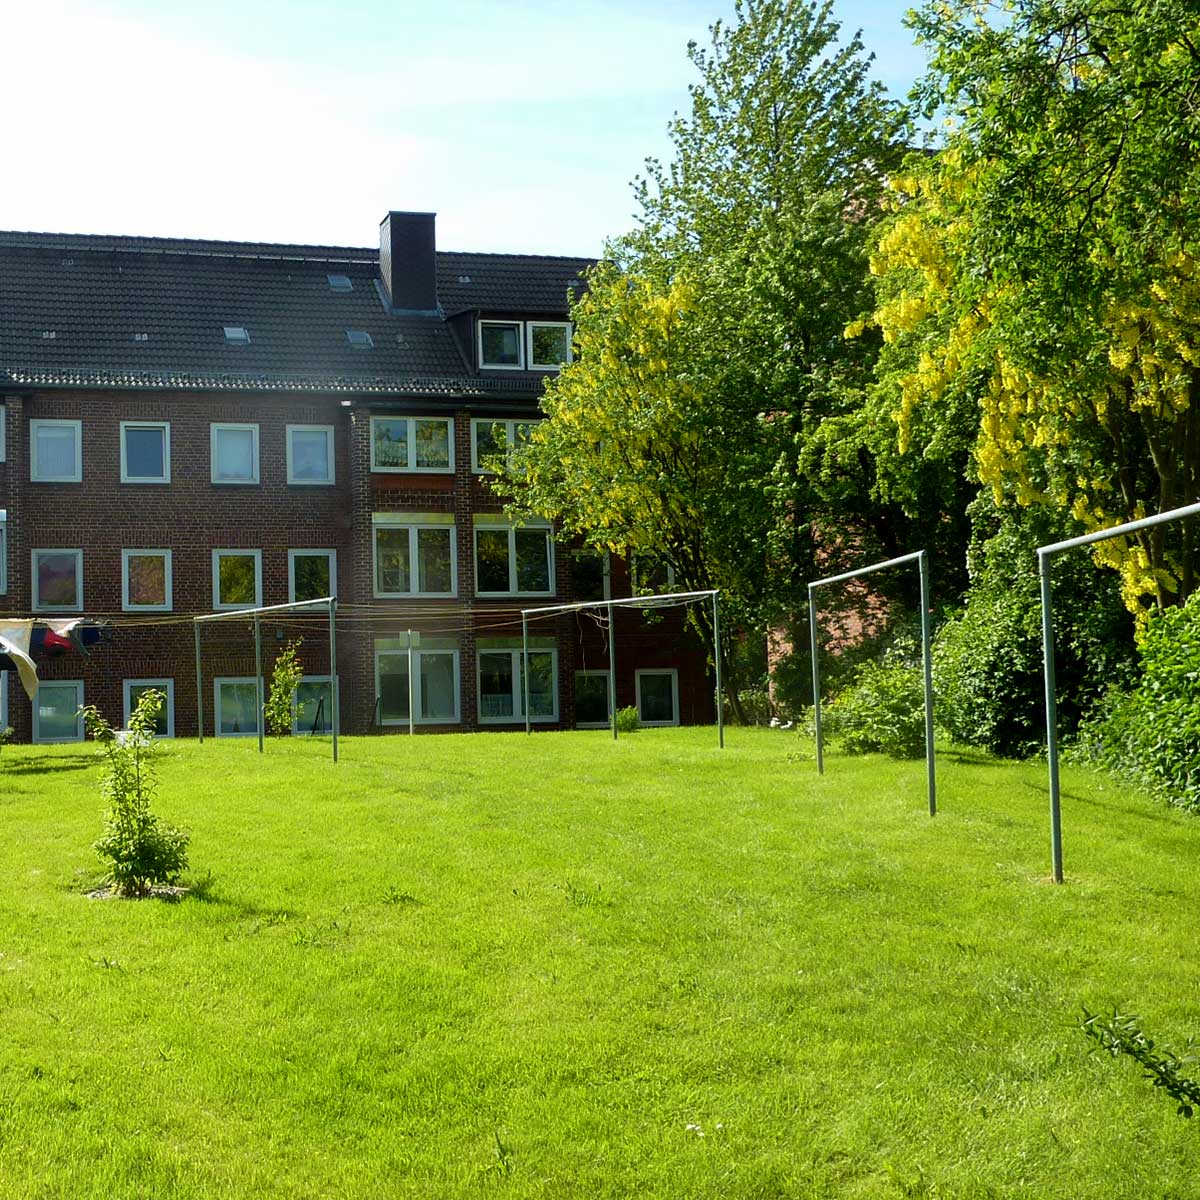 Hofansicht der Häuser Rendsburger Landstrasse 94-96 der BGH-Kiel